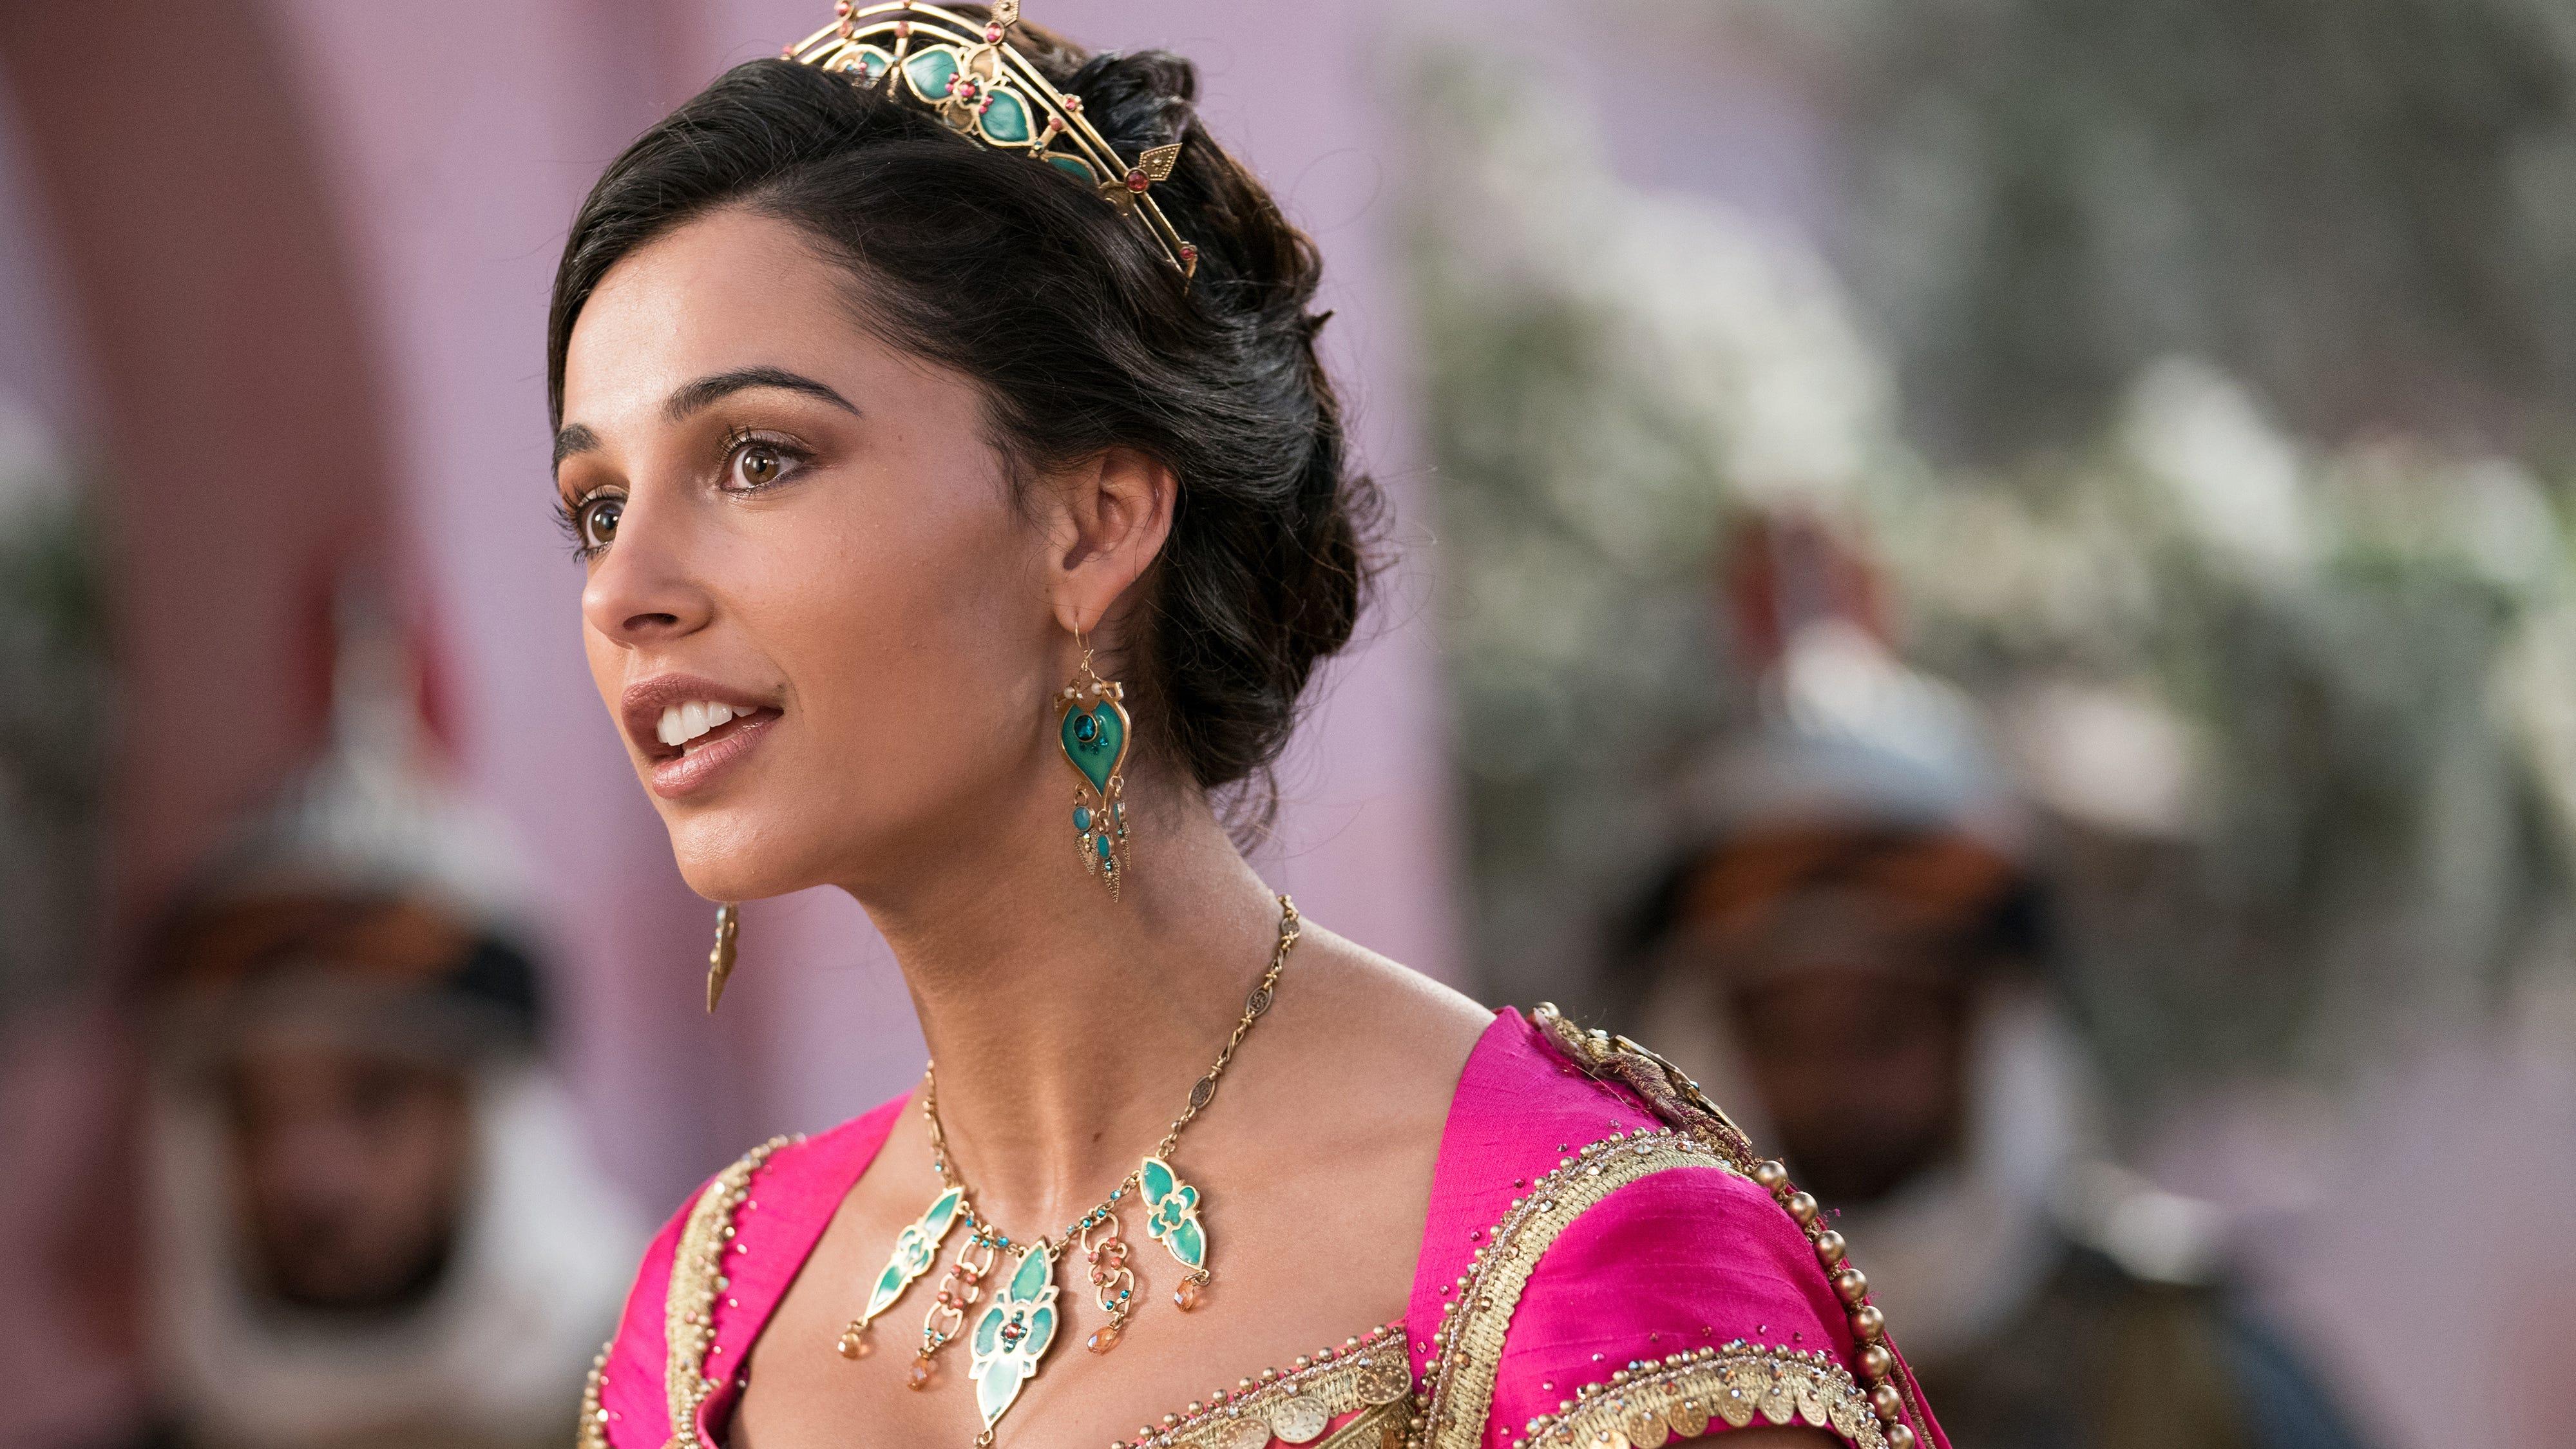 Aladdin 2019: 'Aladdin' Is A Whole New World For Latest Princess Jasmine